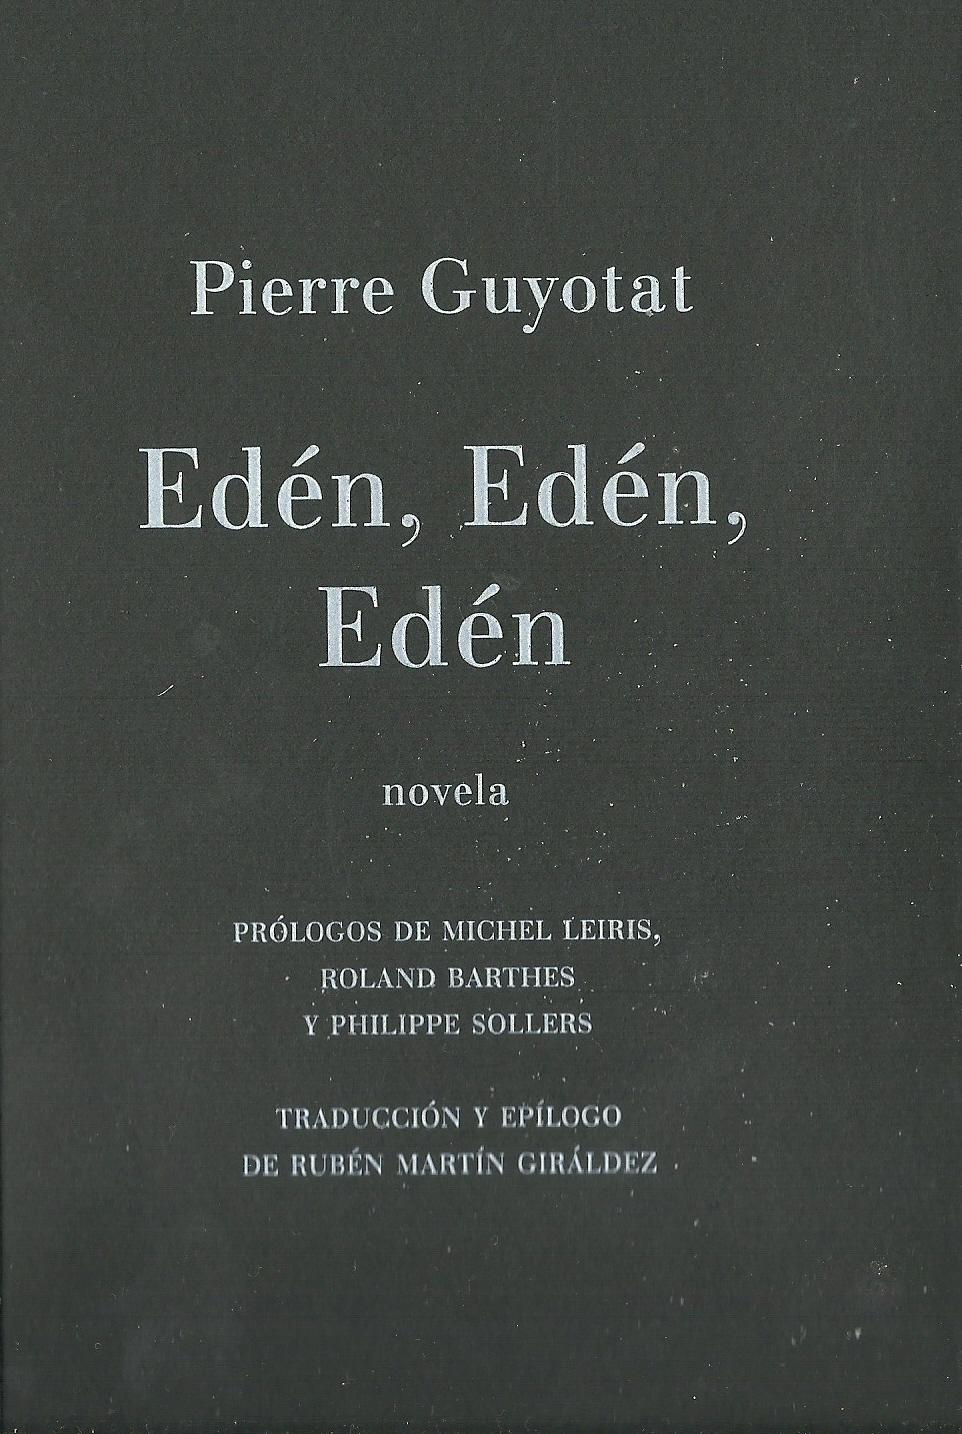 Pierre Guyotat | Edén, Edén, Edén